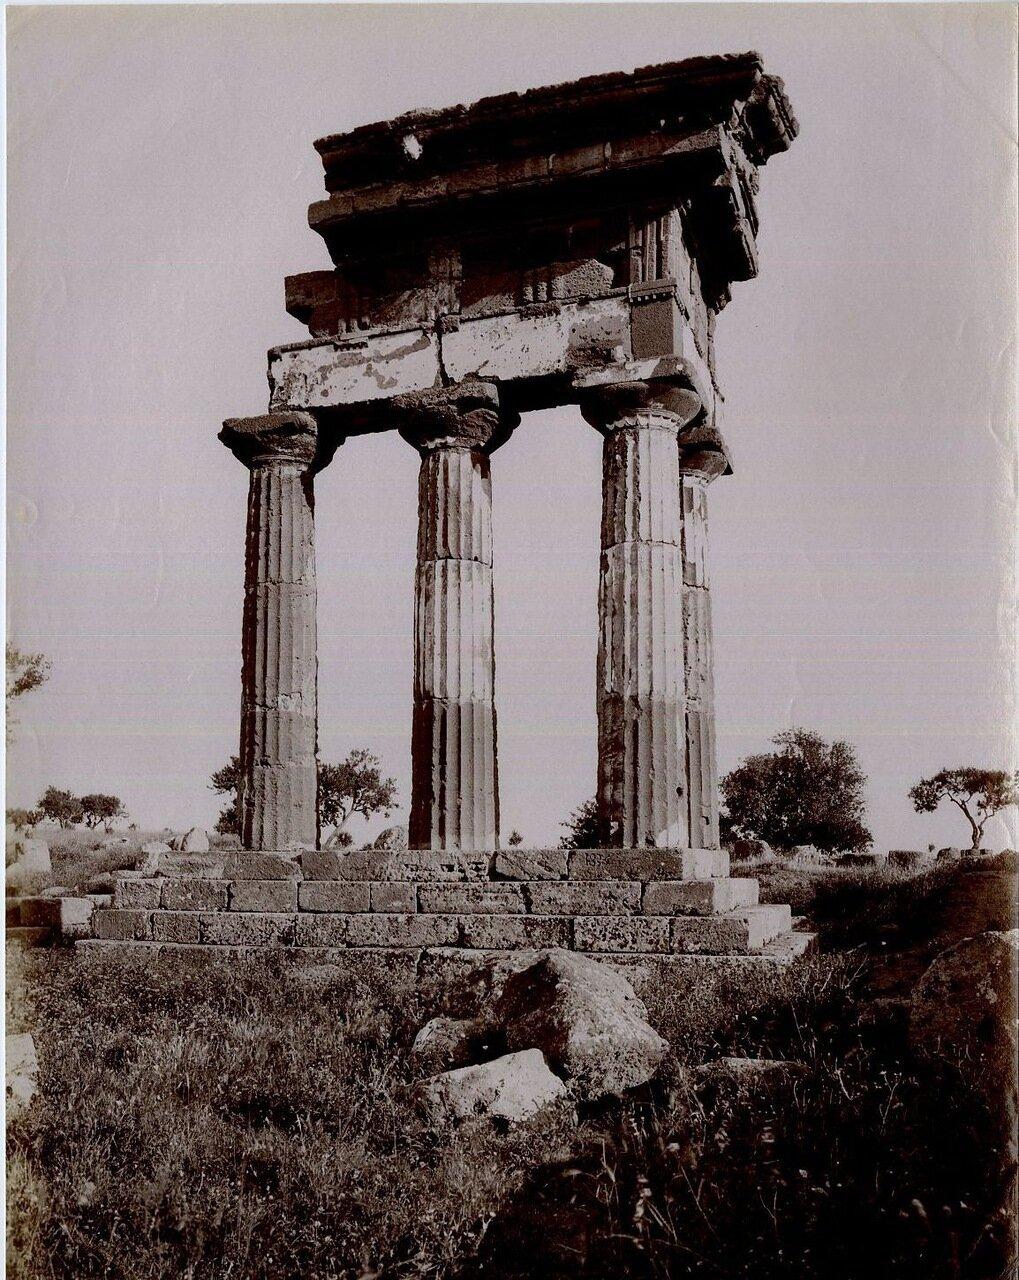 Агригентум. Храм Кастора и Поллукса